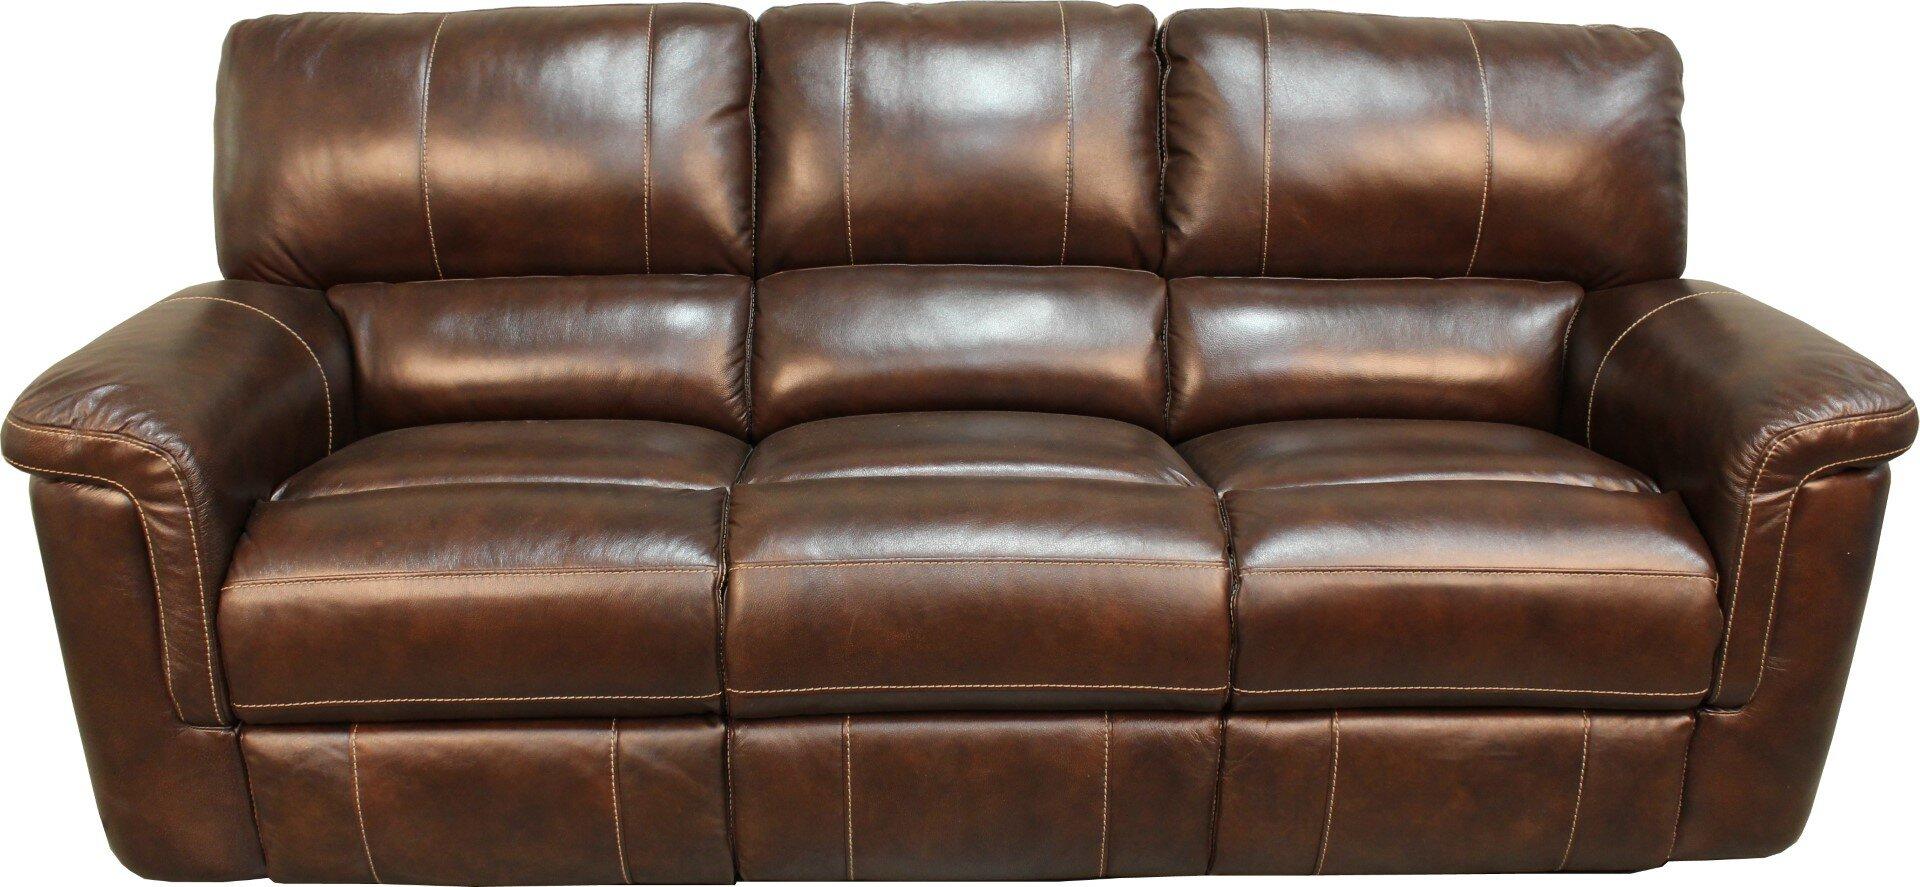 Red Barrel Studio Blair Dual Leather Reclining Sofa